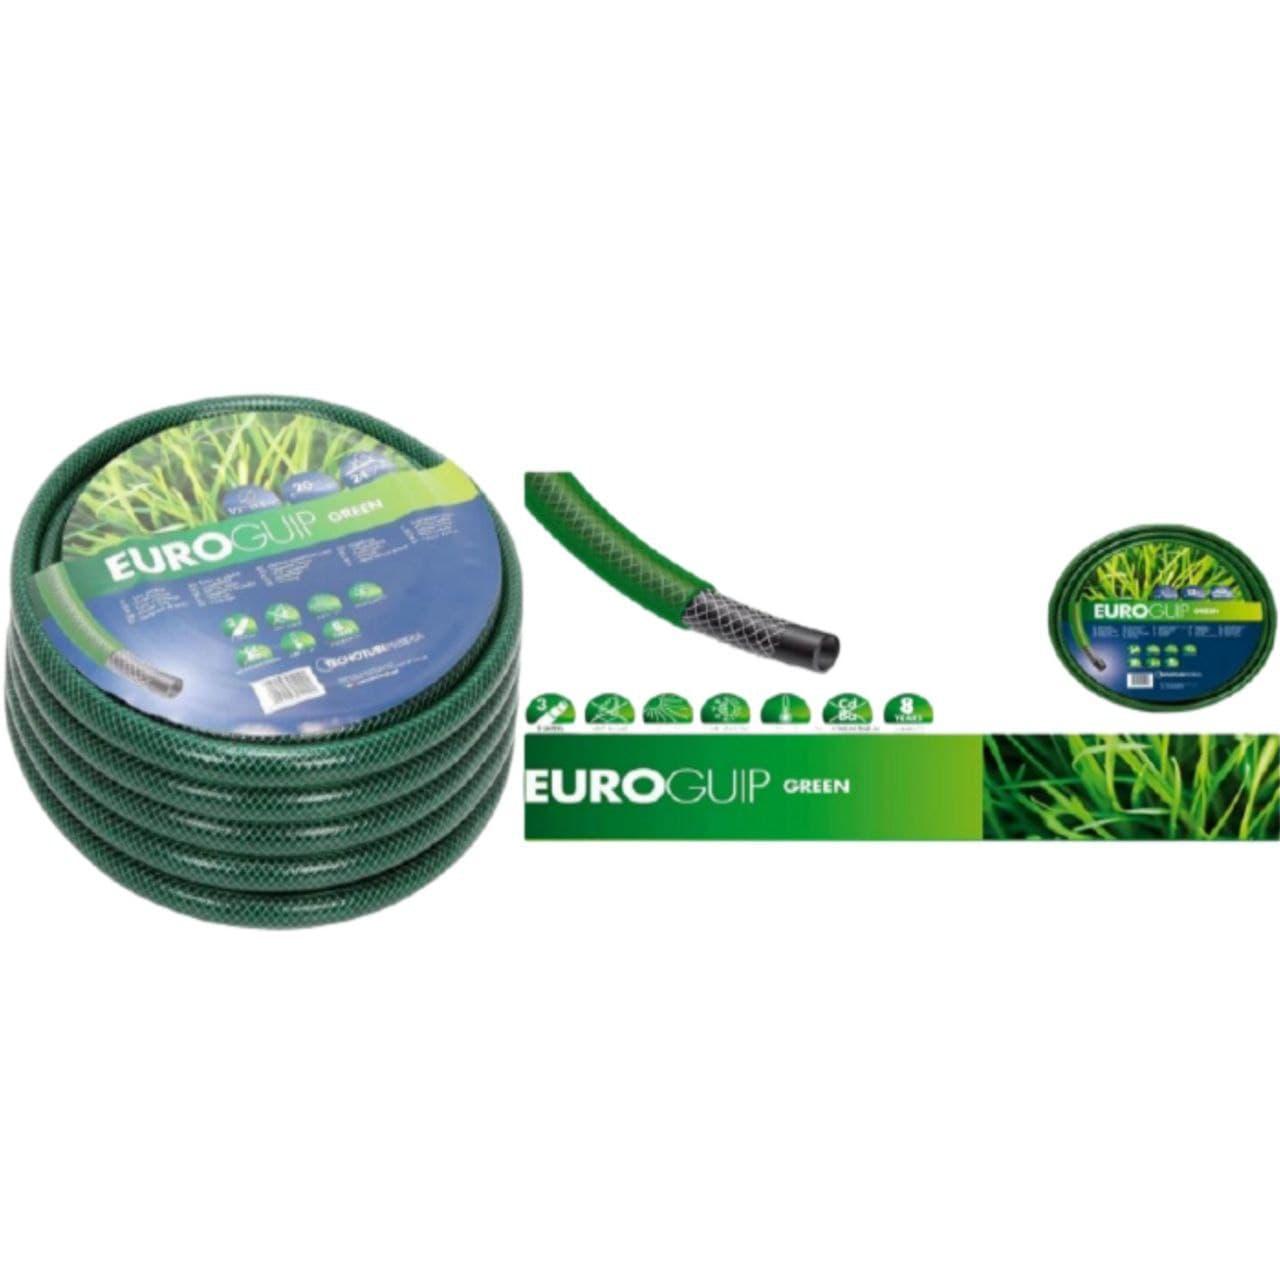 "Italy EuroGuip Green 1"" (25 M) /TecnoTubi Picena/"